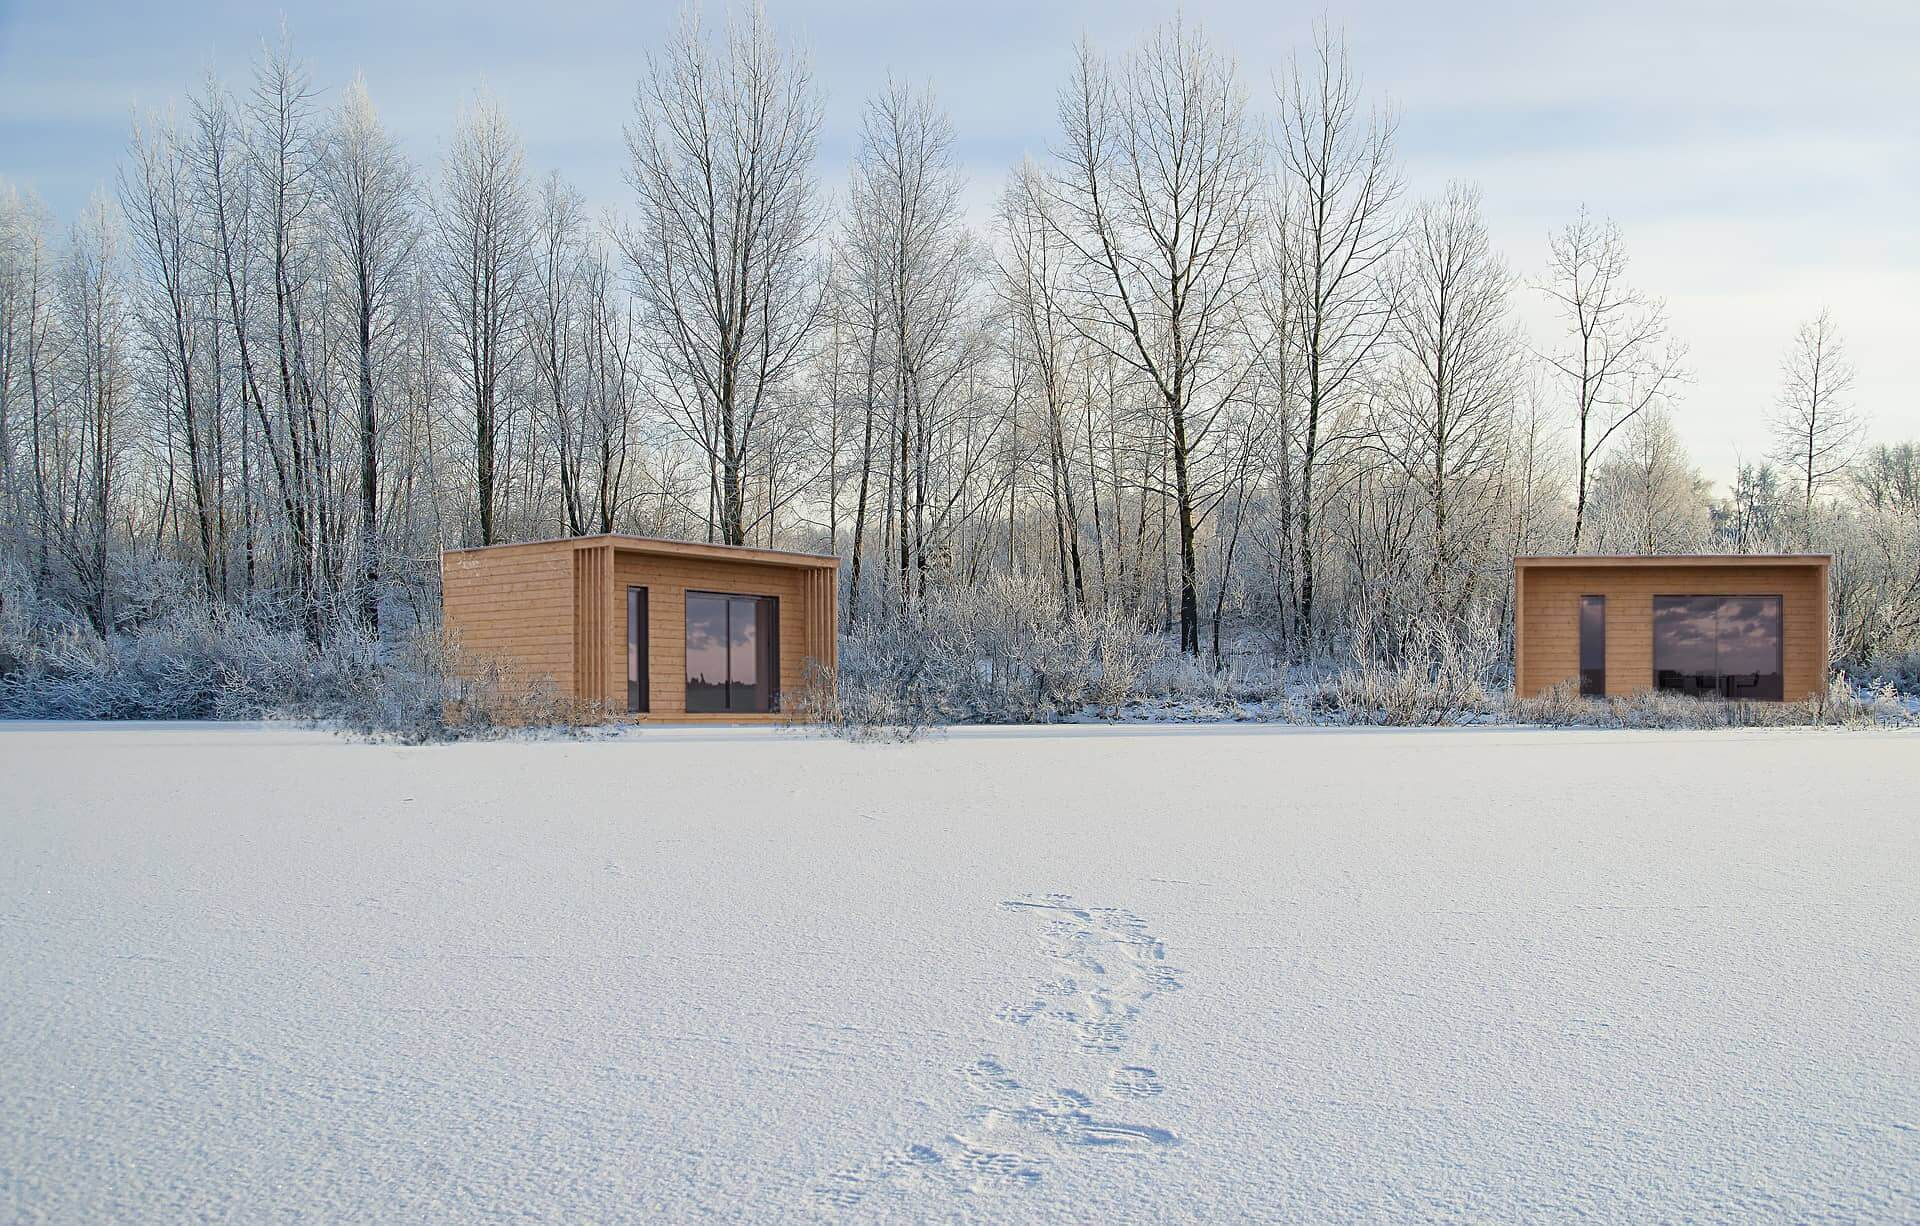 studio de jardin 20m2 woodyloft. Black Bedroom Furniture Sets. Home Design Ideas